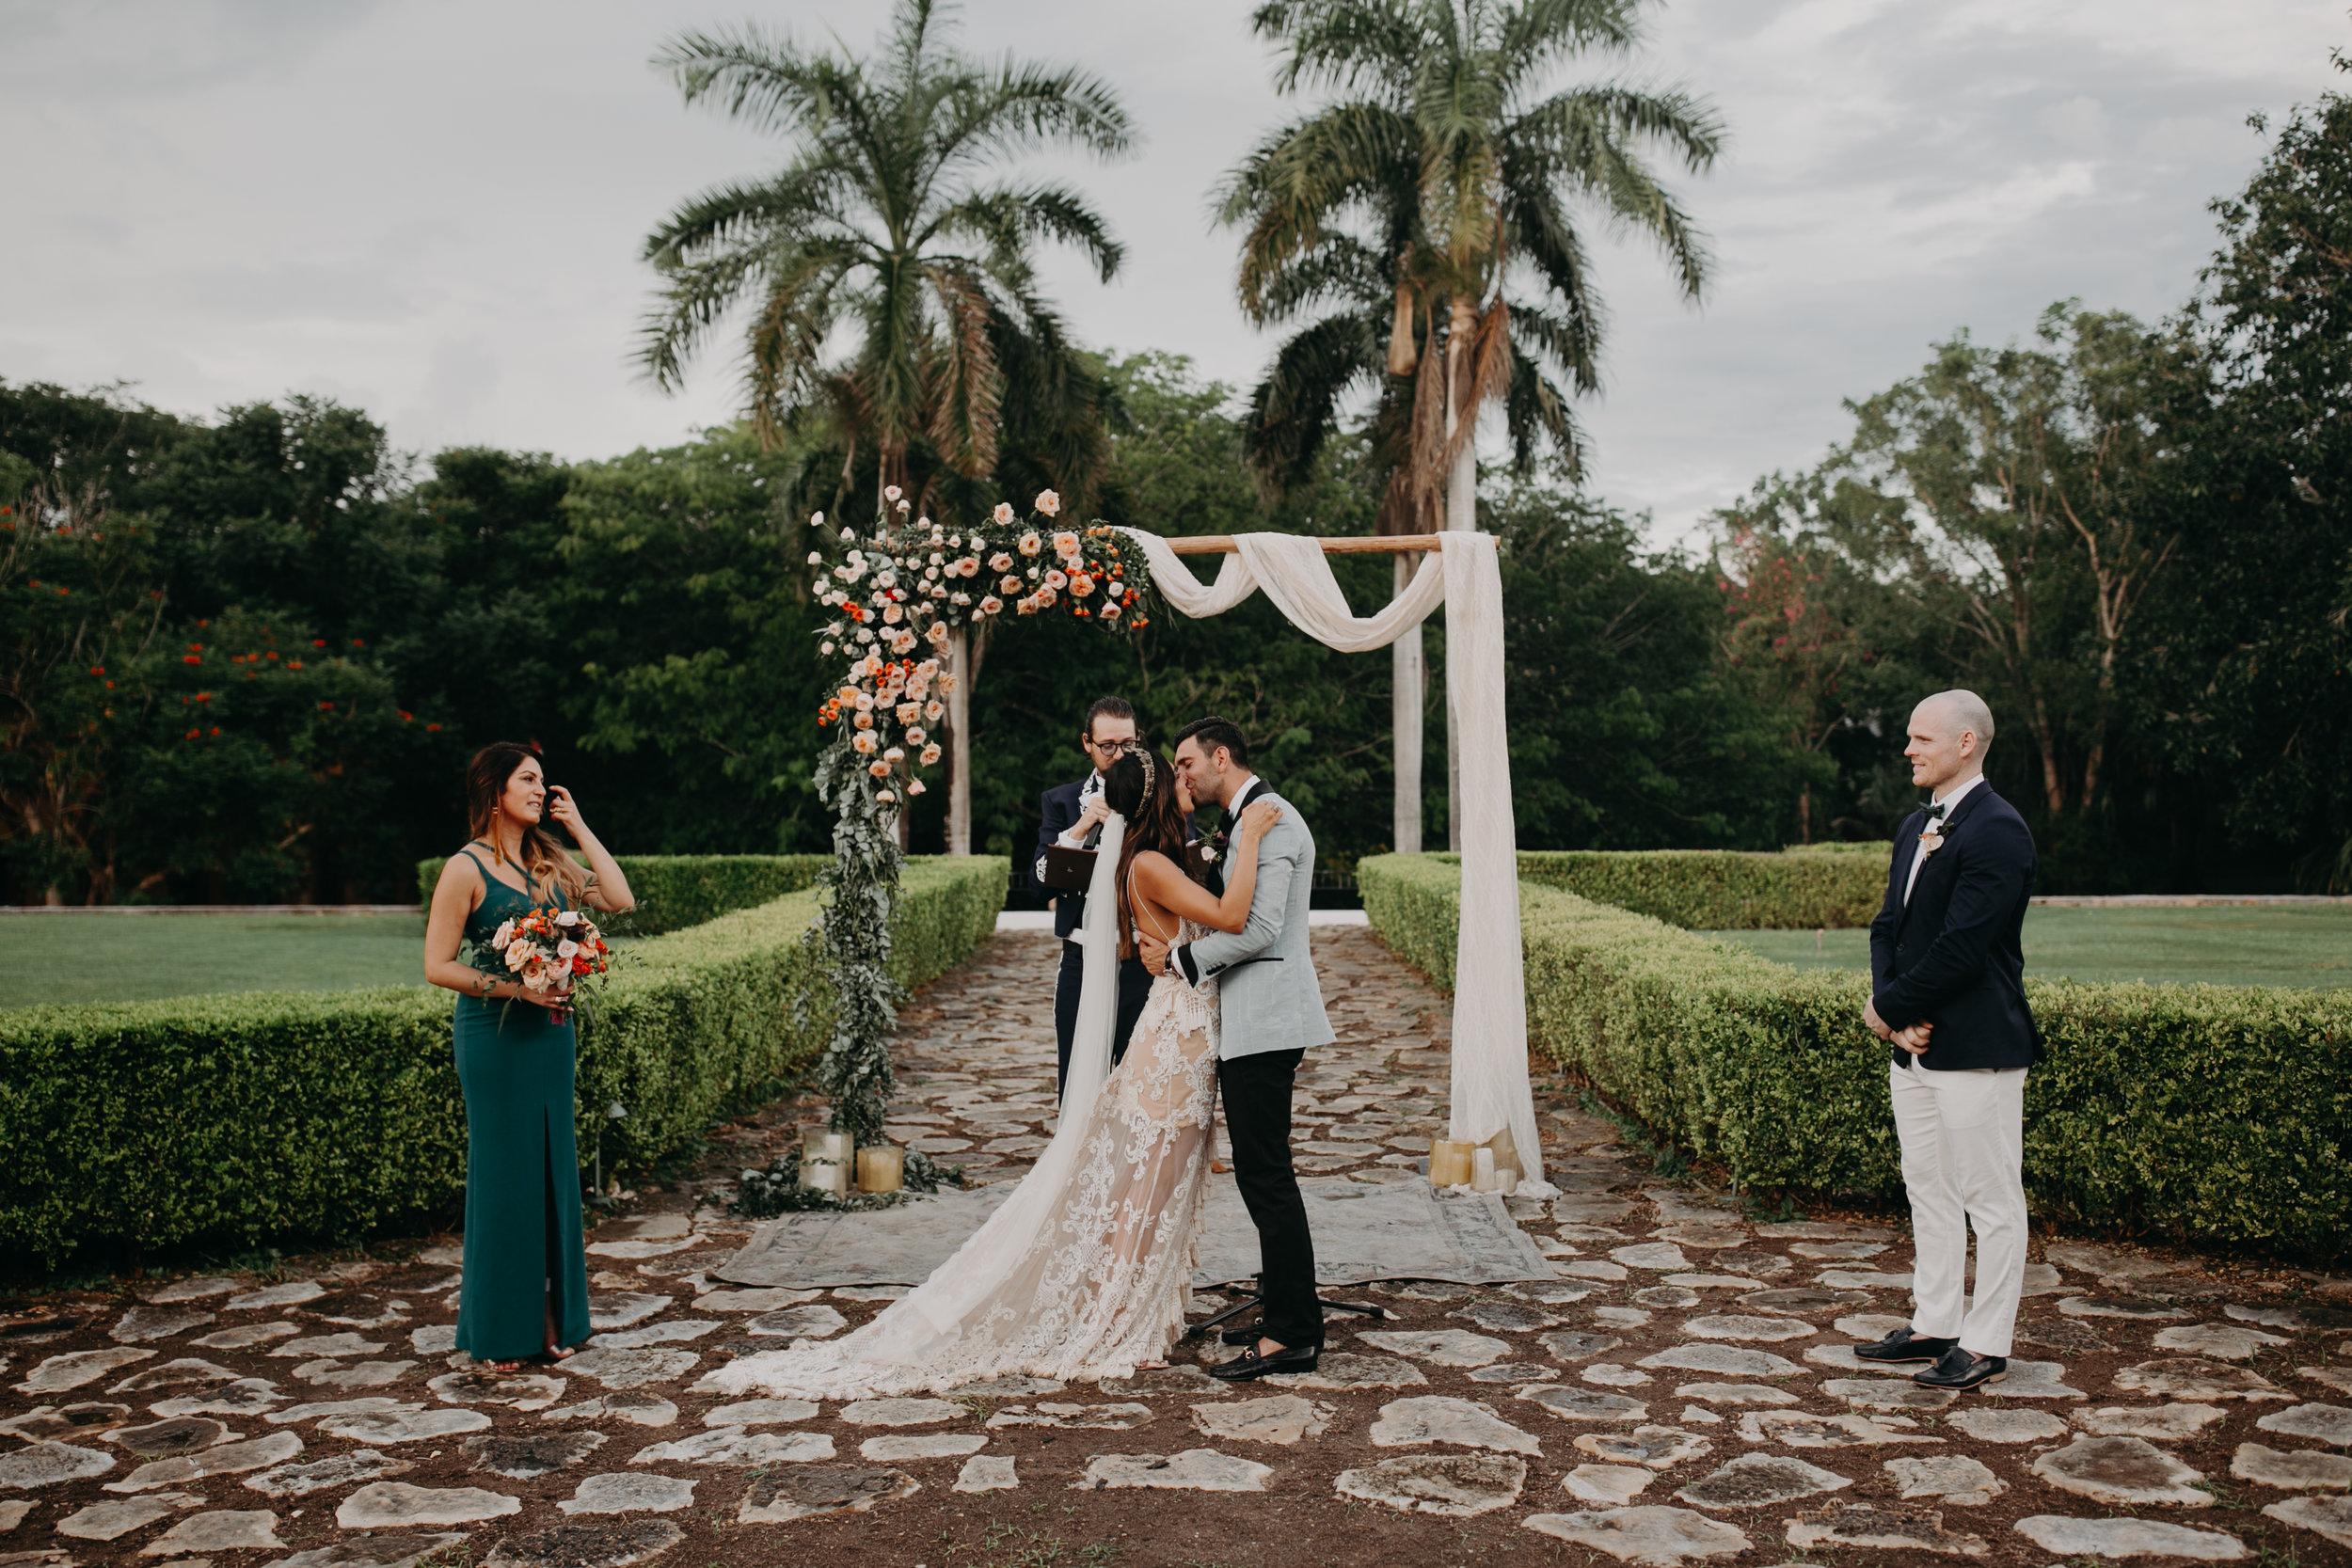 Hacienda Temozon Yucatan Mexico Wedding | Ida & Peter Emily Magers Photography-1094.jpg